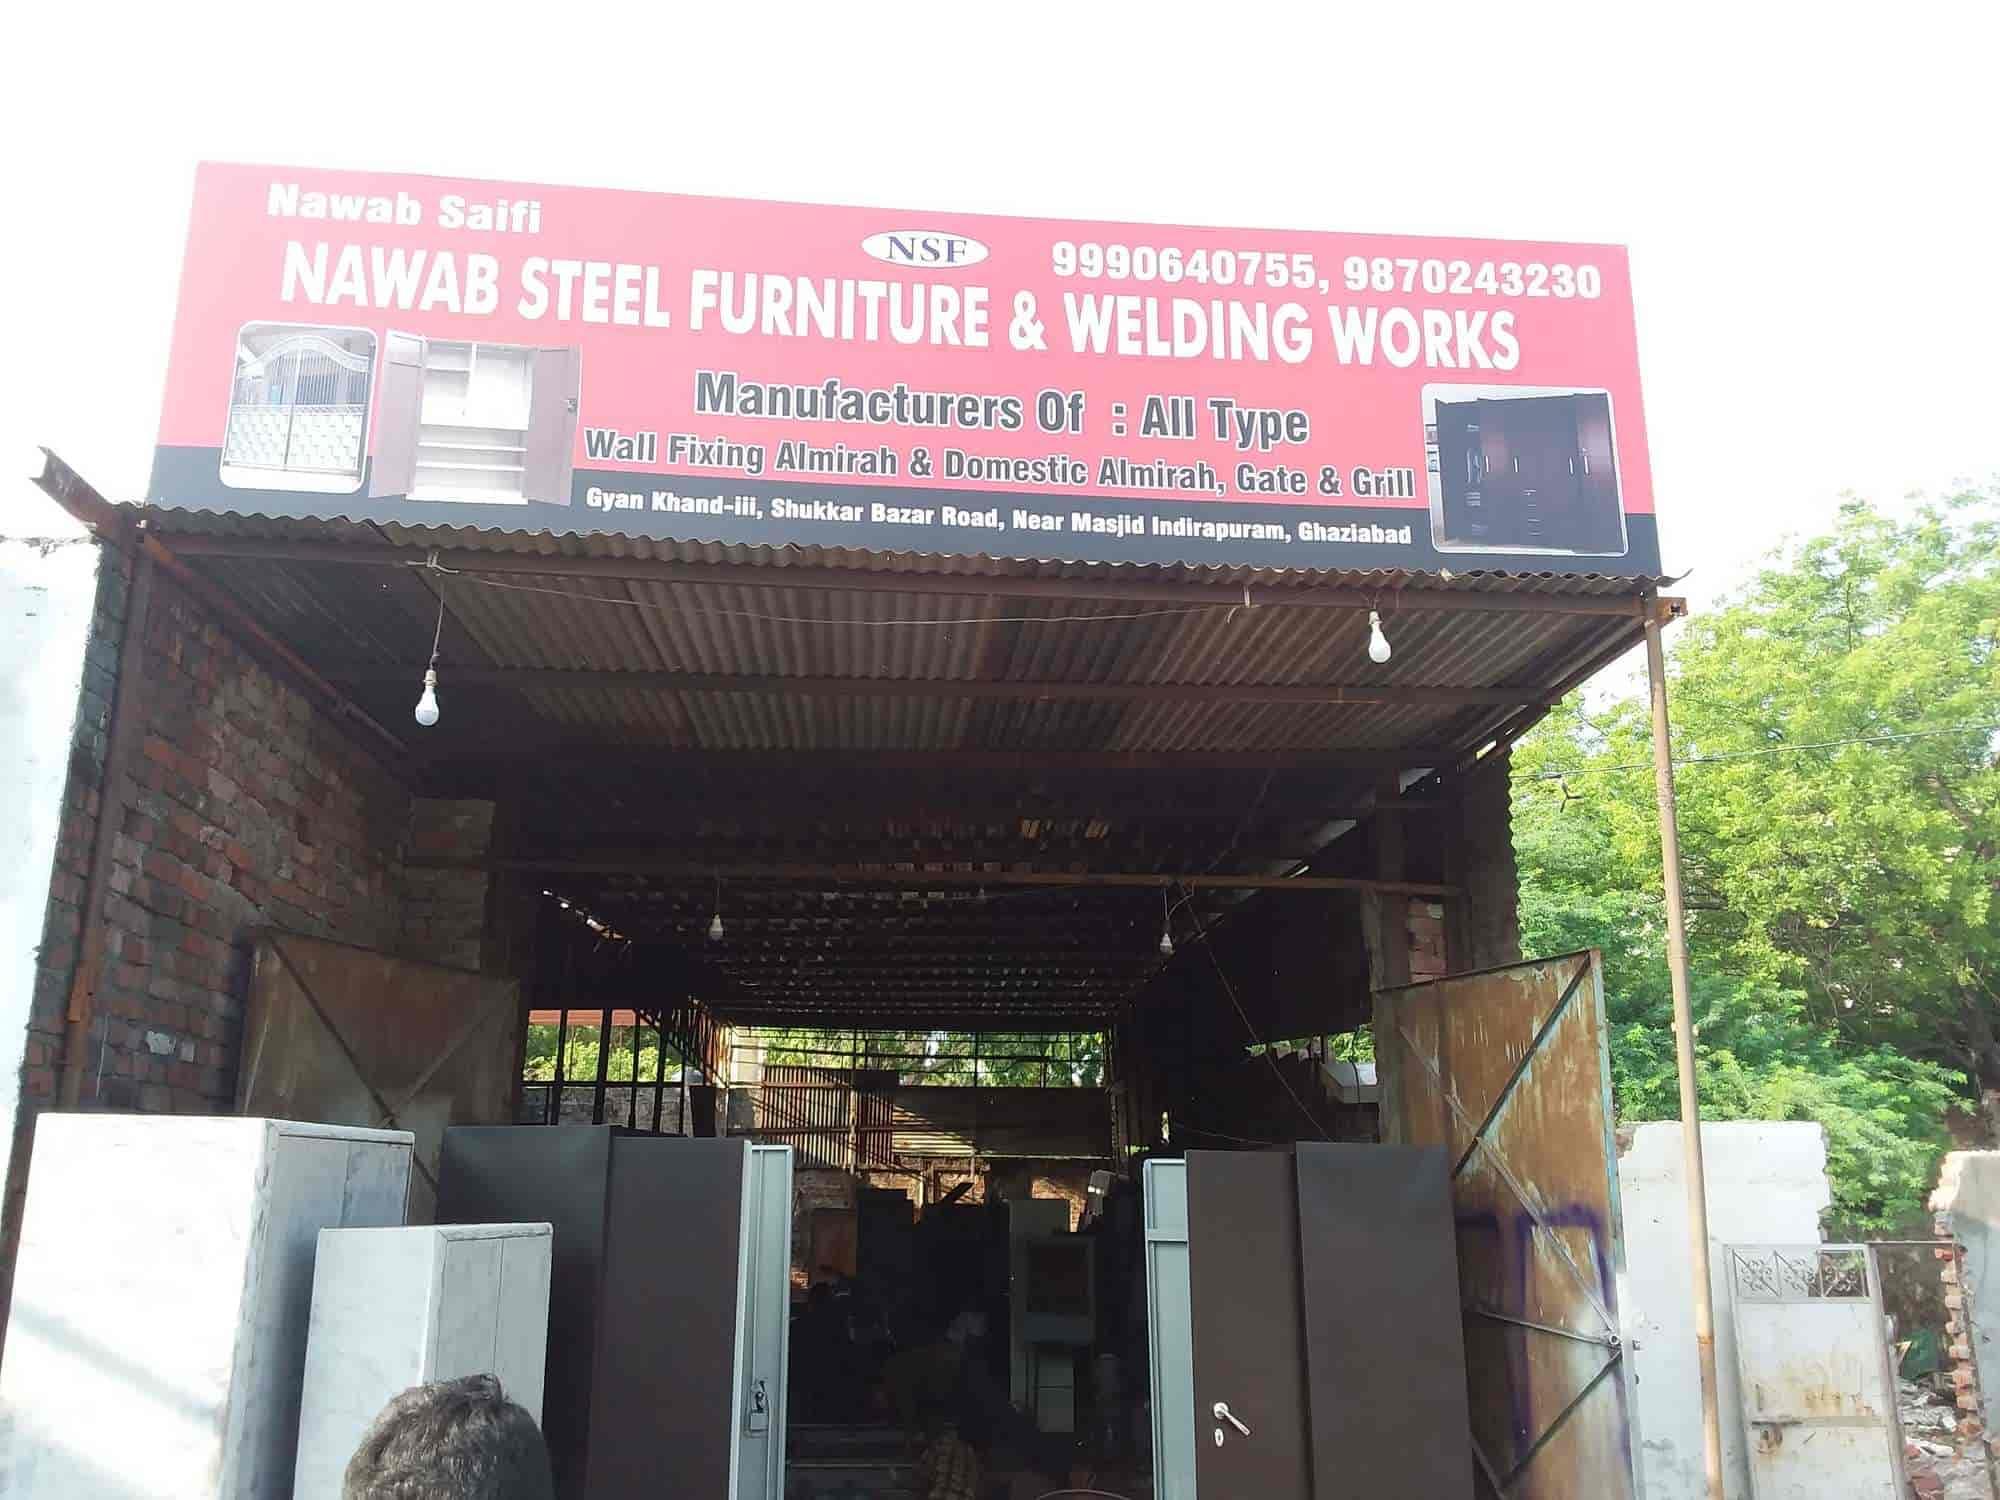 Nawab Steel Furniture Welding Works Photos, Indirapuram